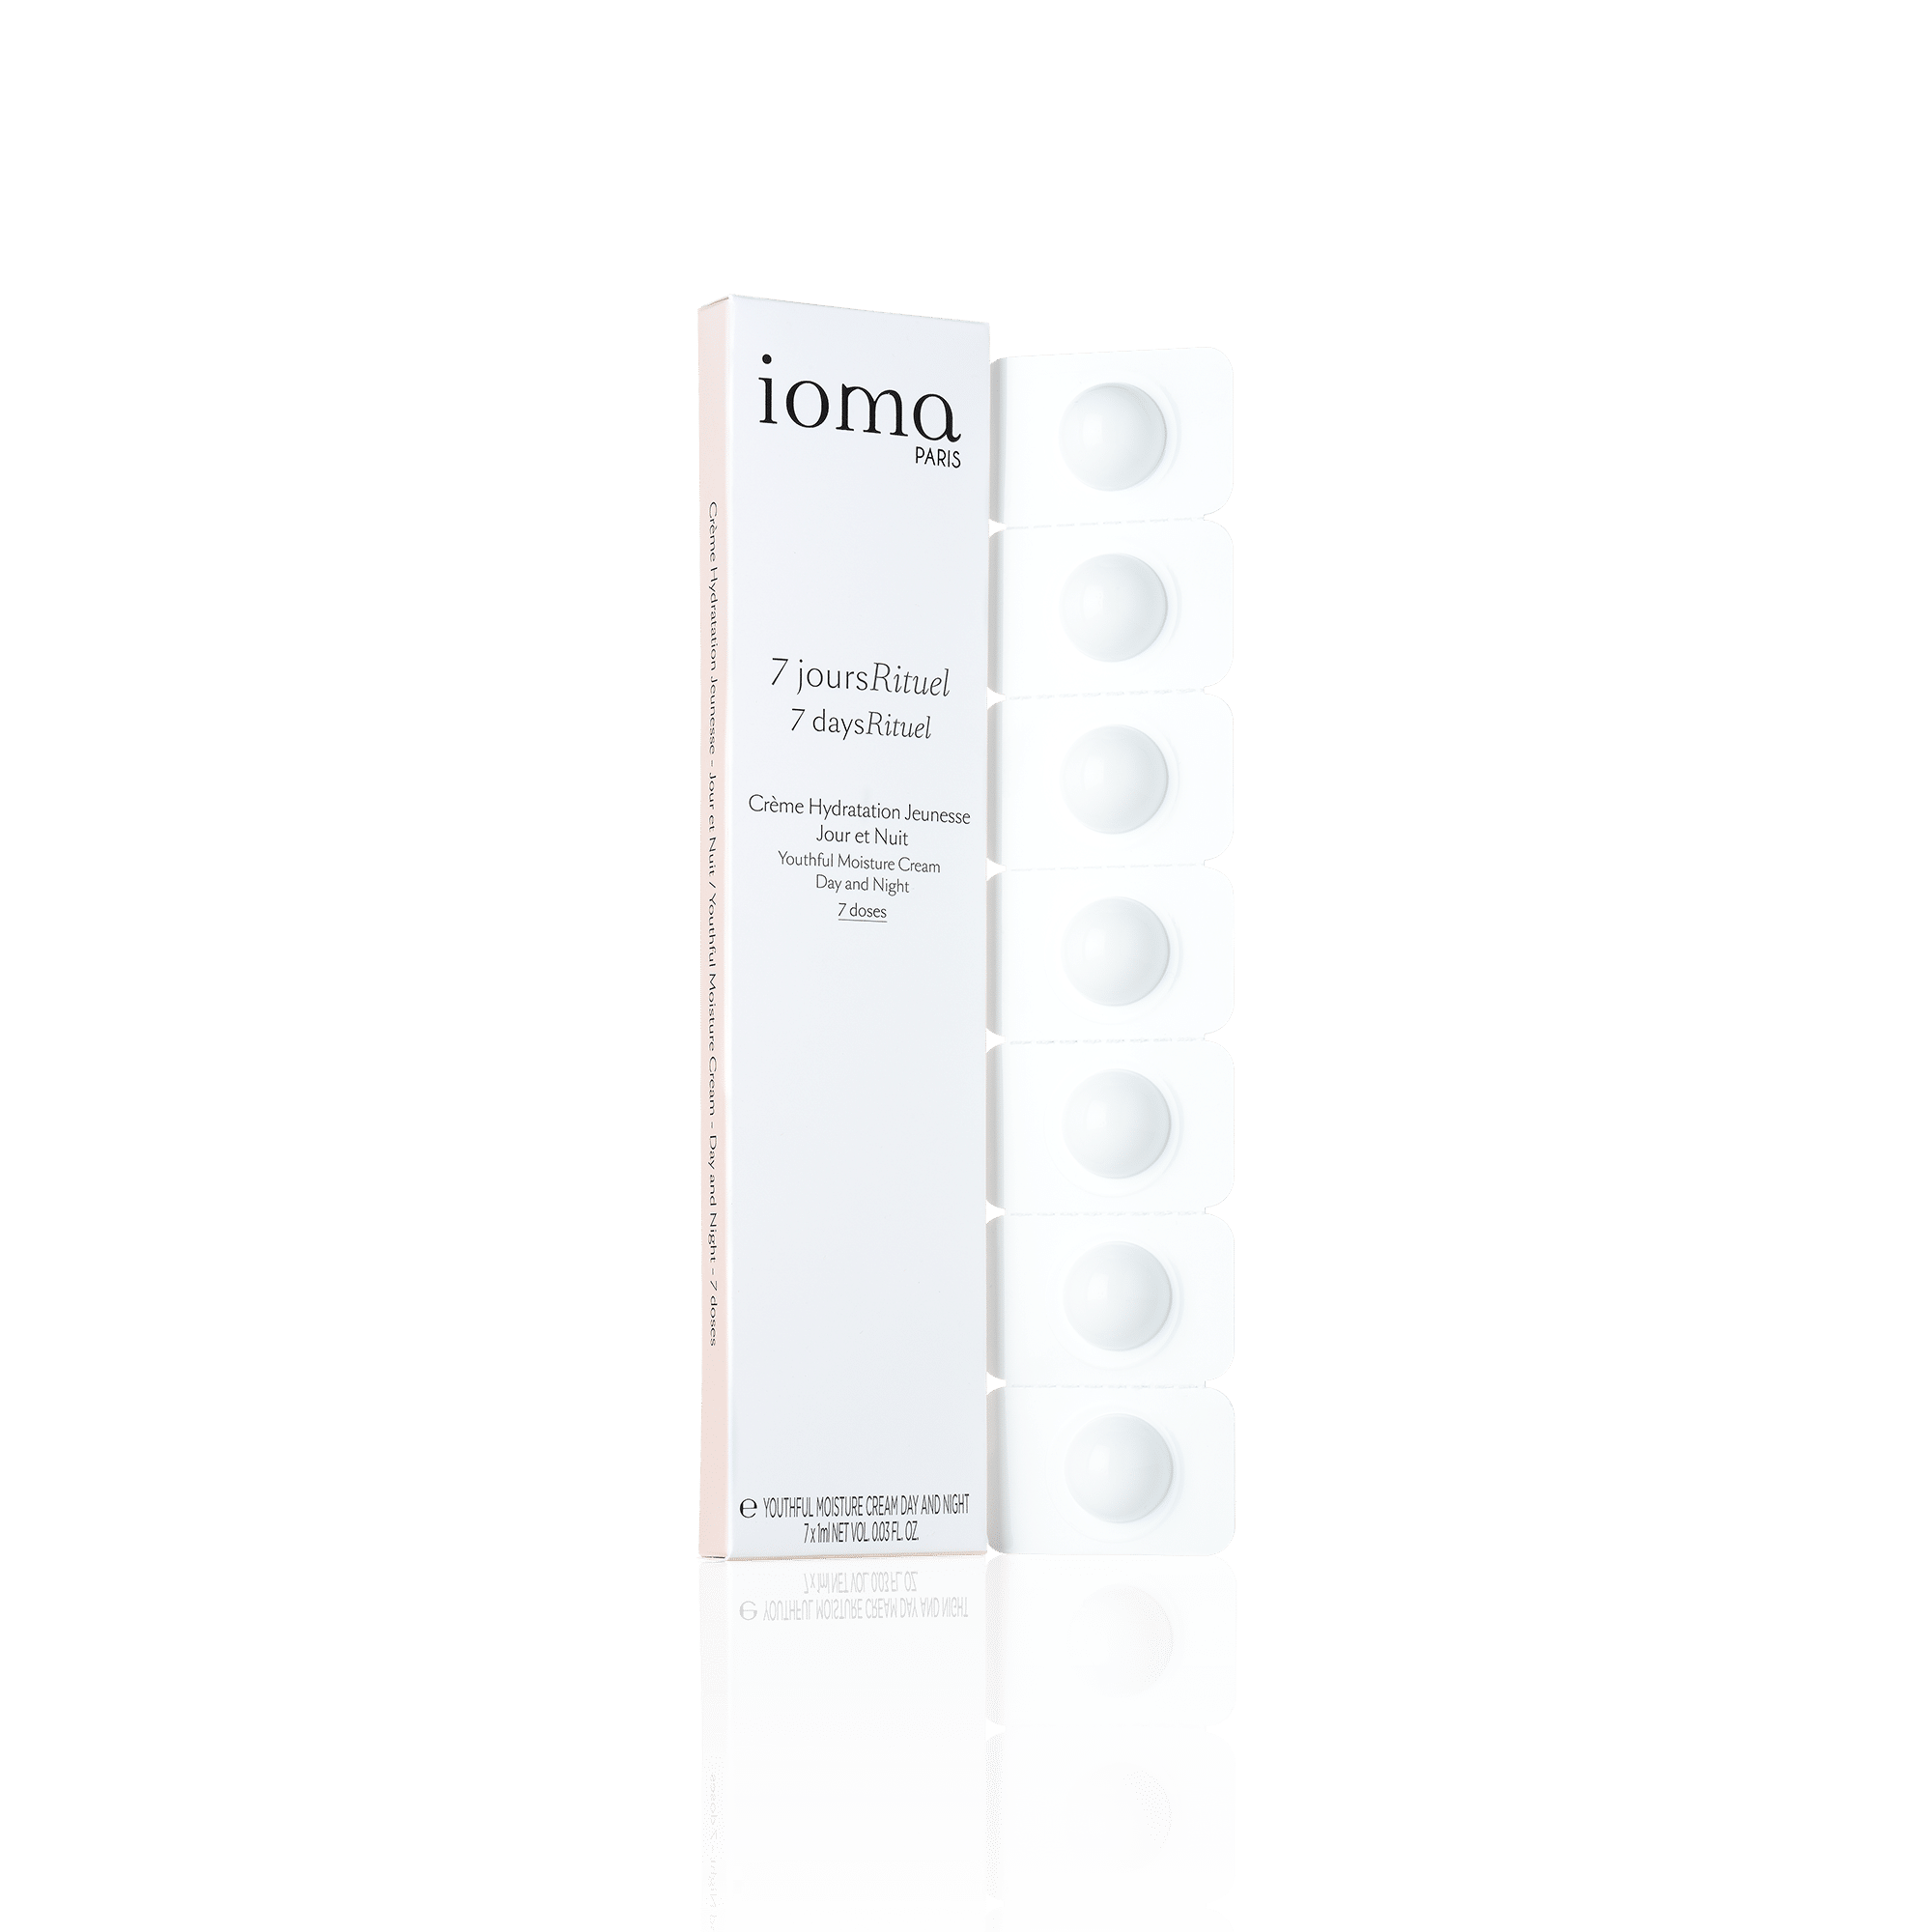 IOMA Tabs : Youthful Moisture Cream